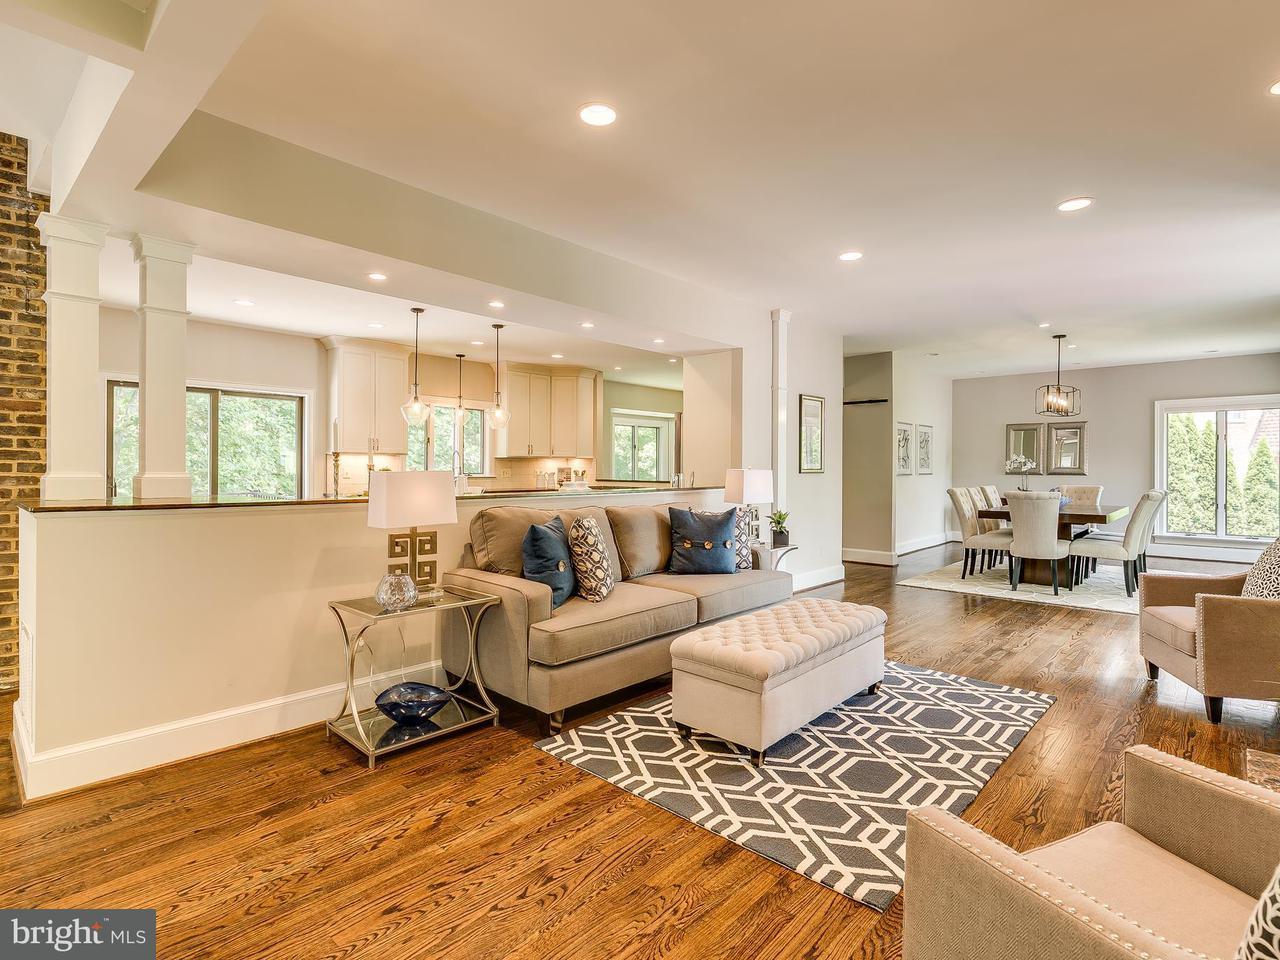 Single Family Home for Sale at 1400 Ingeborg Court 1400 Ingeborg Court McLean, Virginia 22101 United States